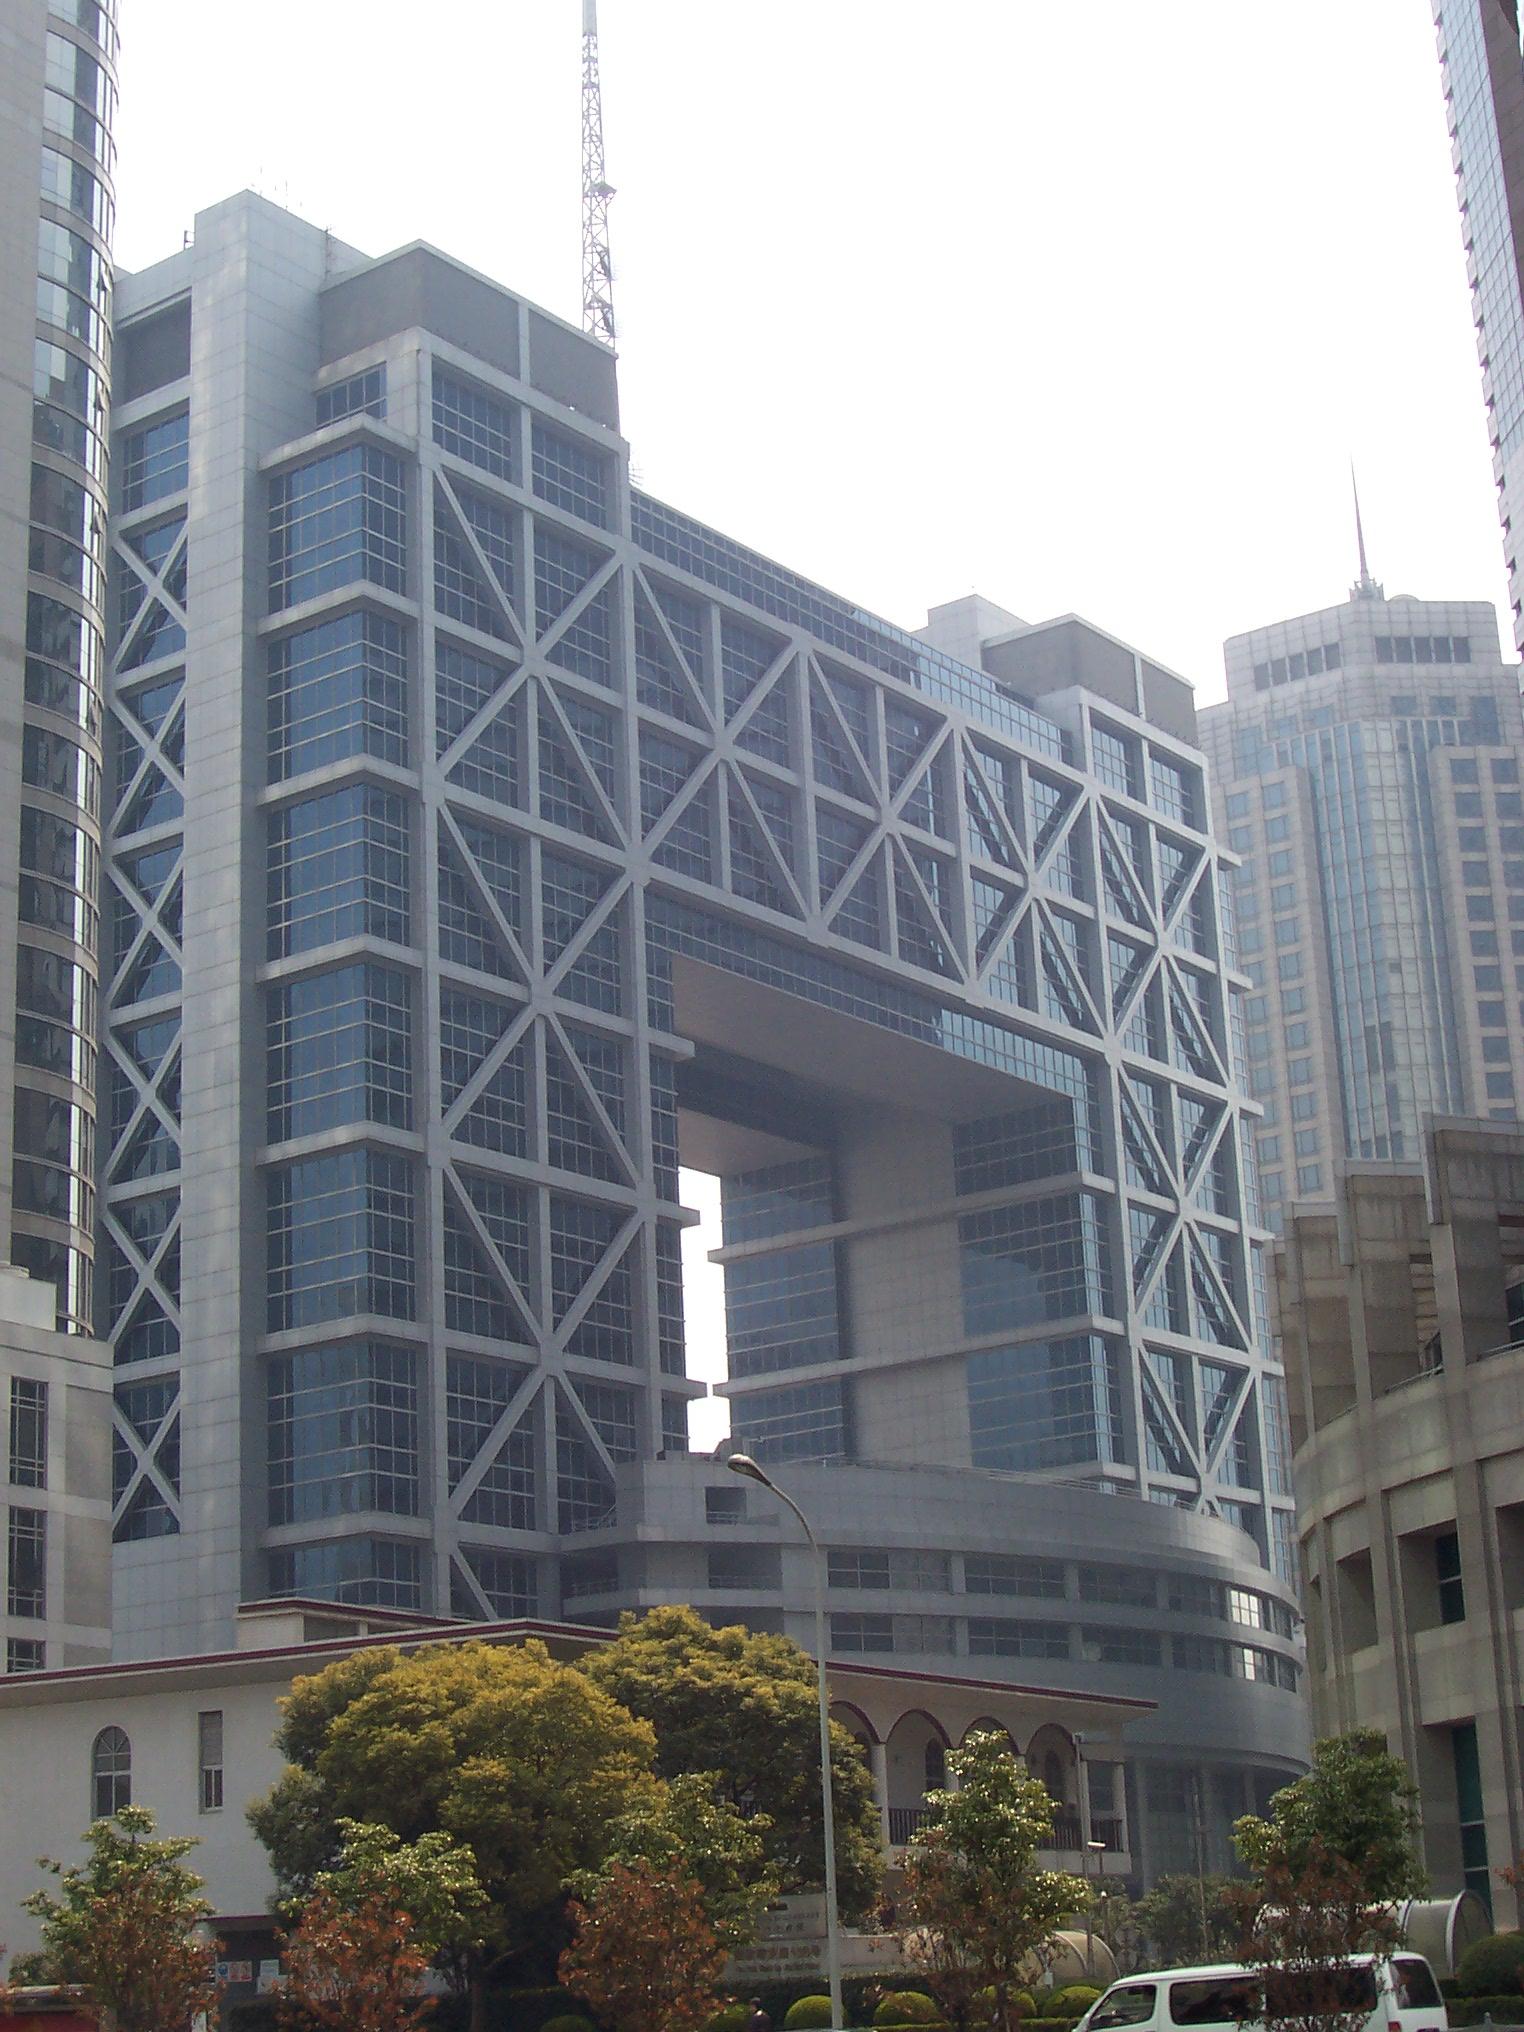 Shanghai Stock Exchange - Wikipedia